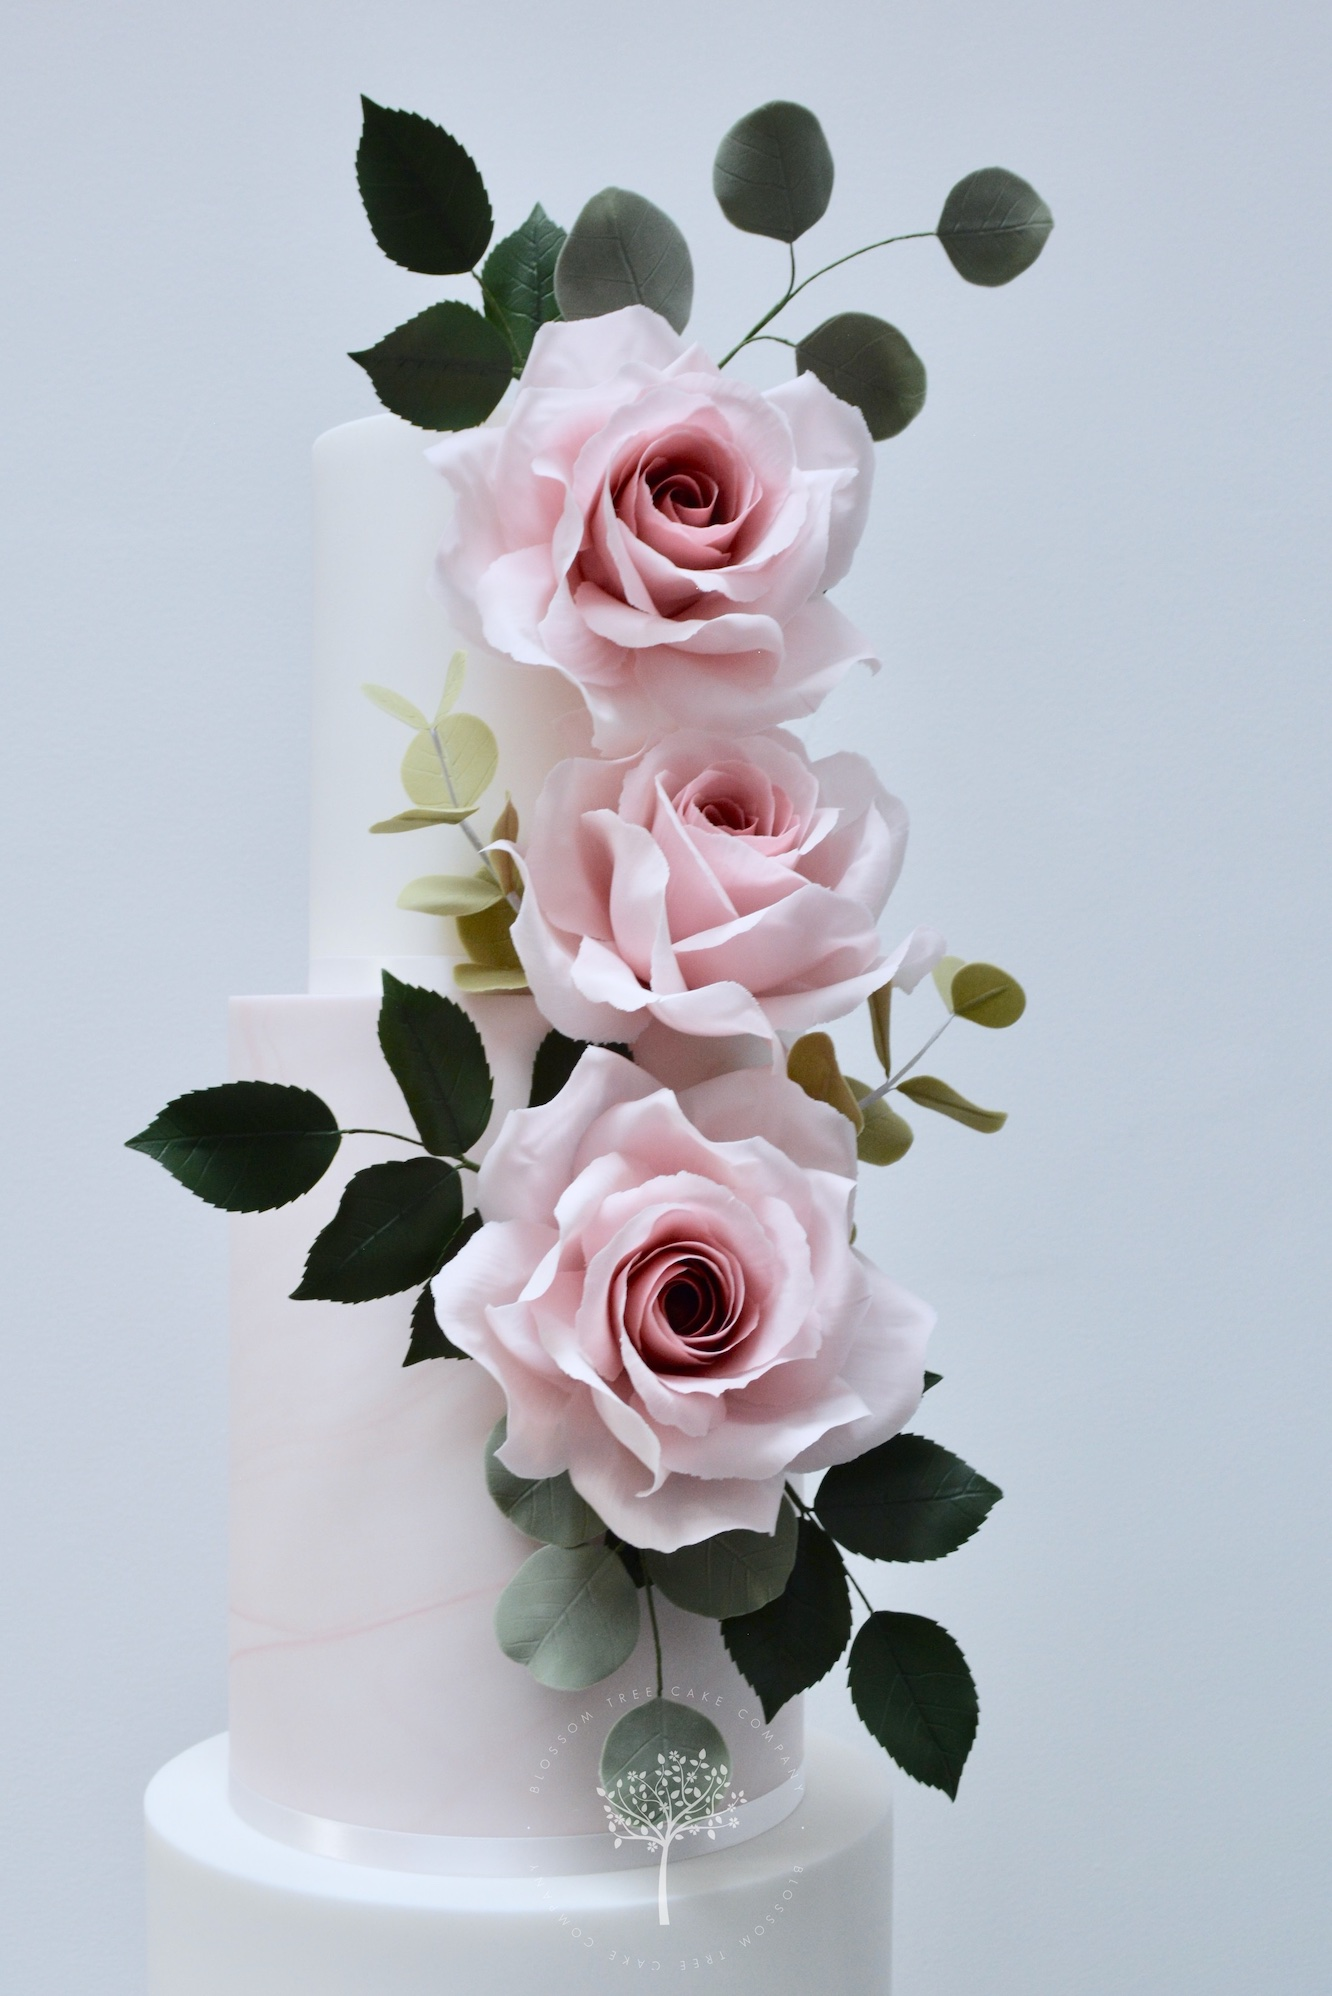 Garden Rose wedding cake by Blossom Tree Cake Company Harrogate North Yorkshire - top sugar roses.jpg